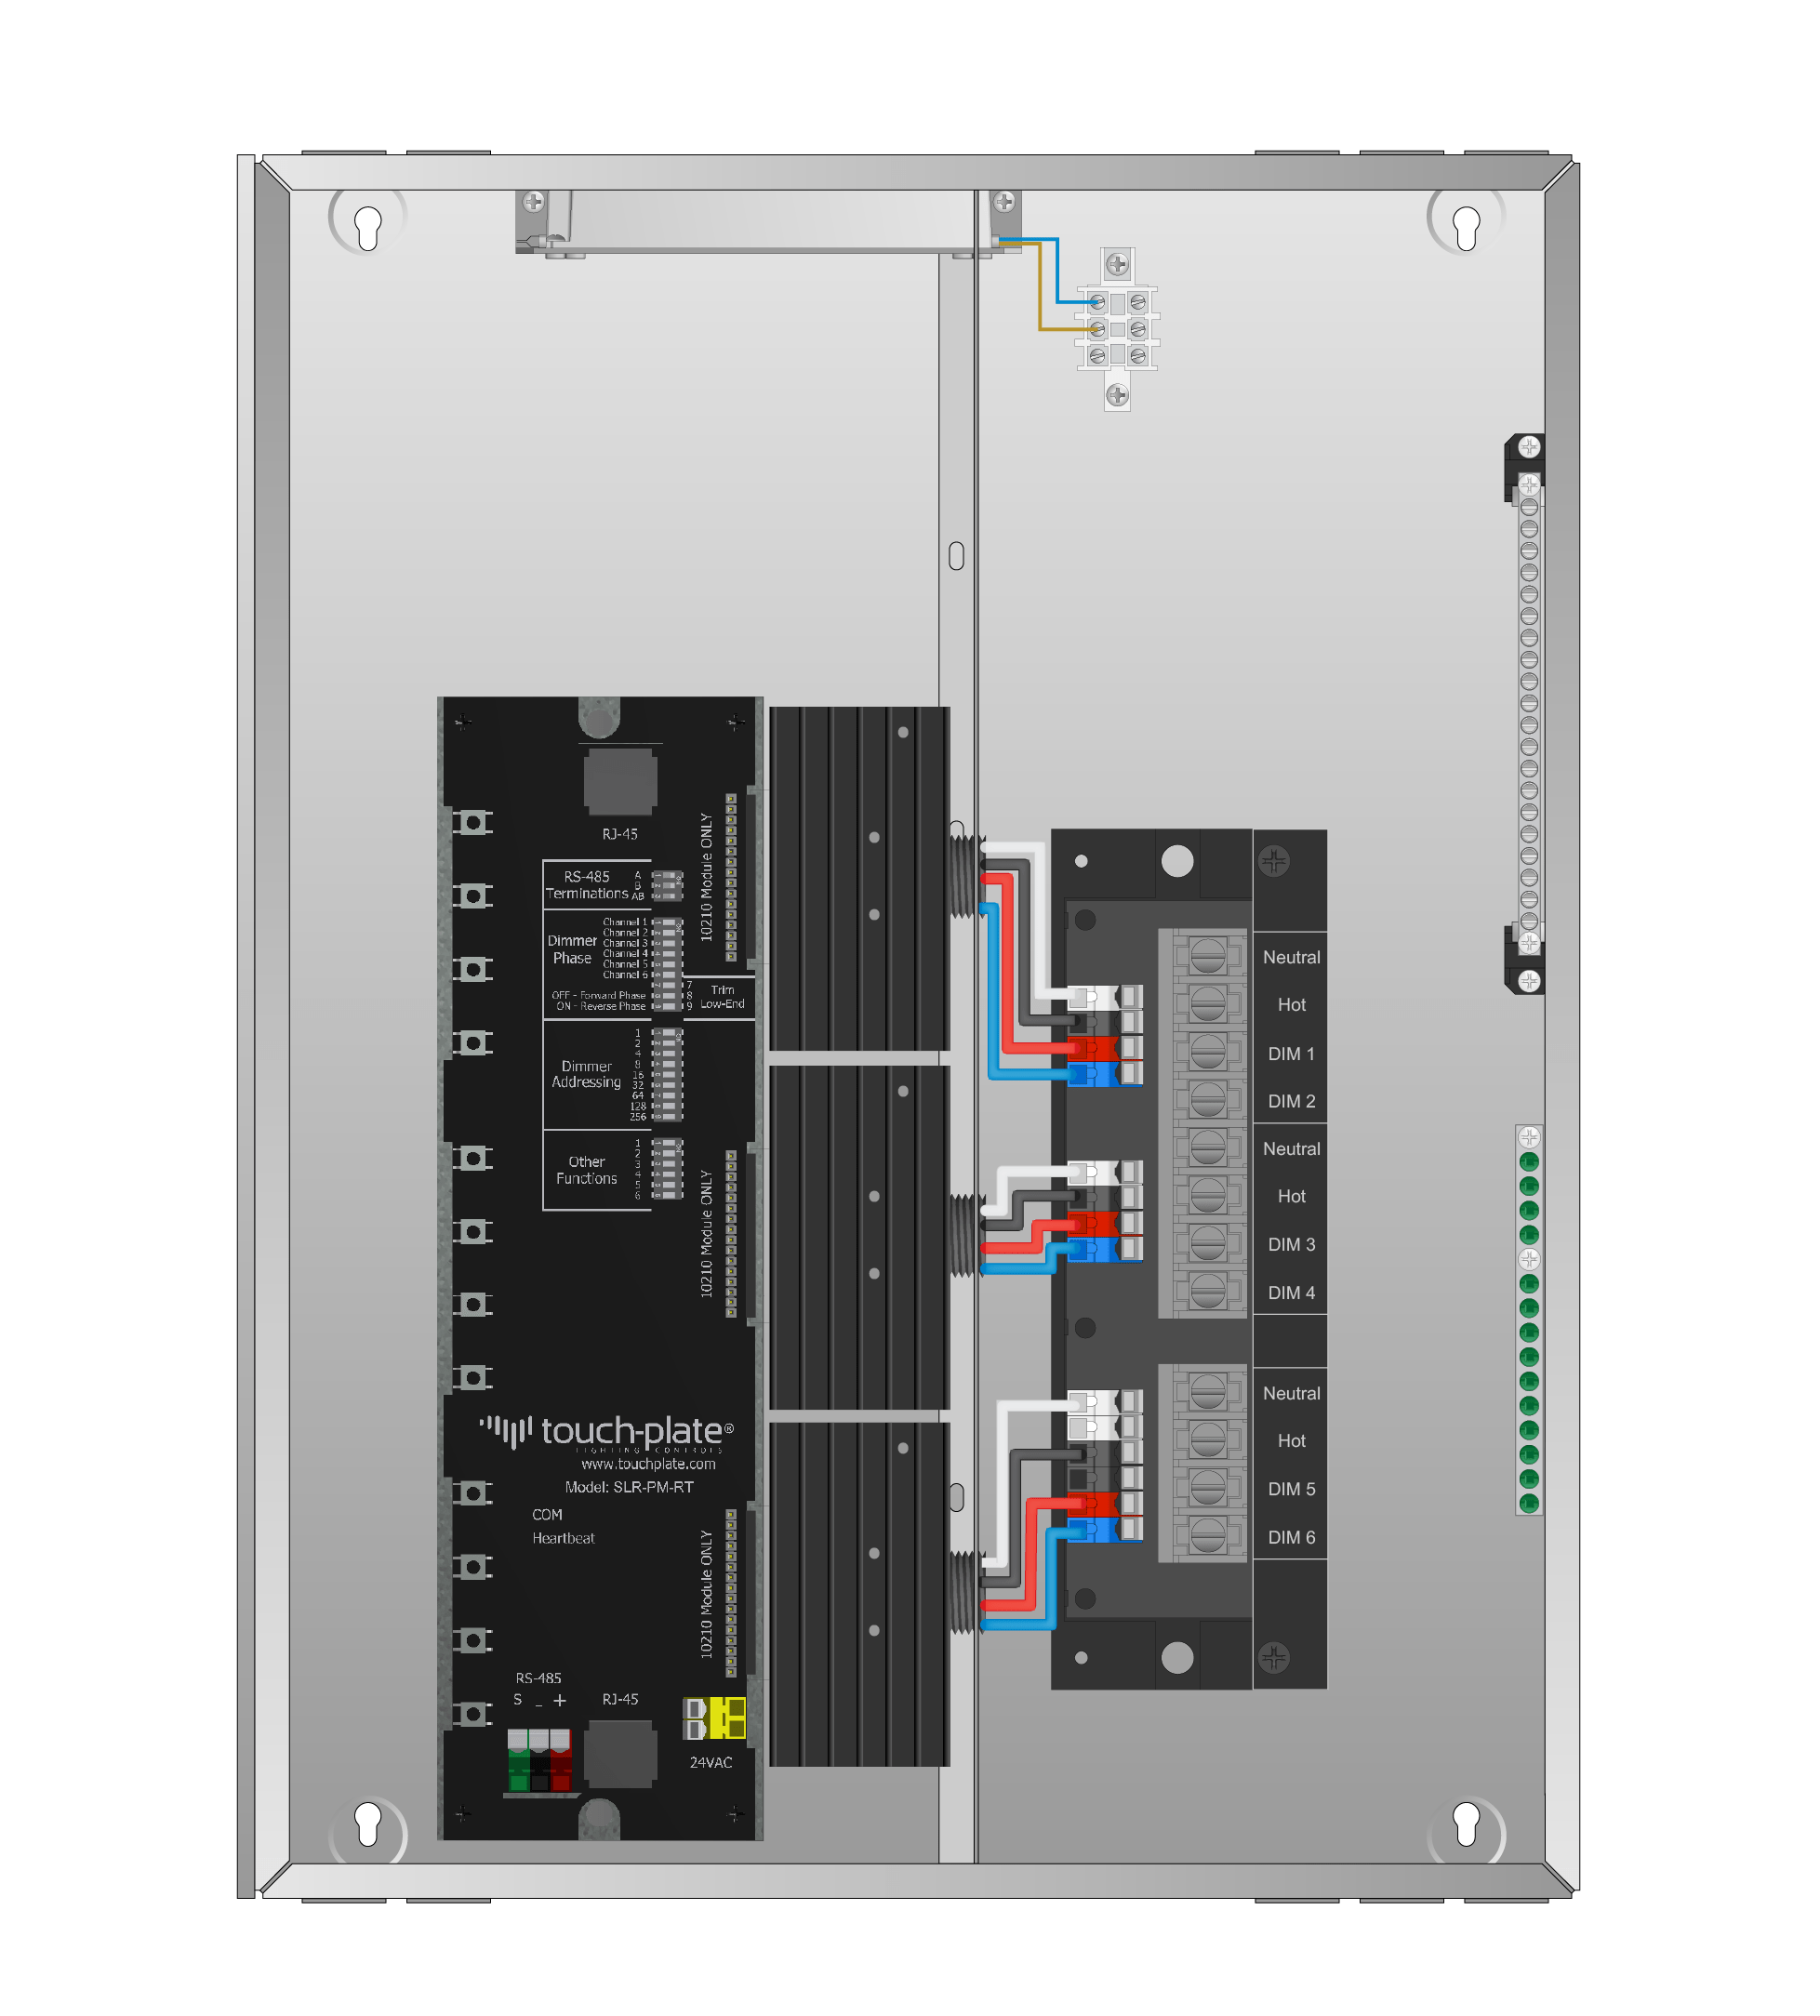 lighting relay panel wiring diagram mitsubishi triton mn radio touch plate 32